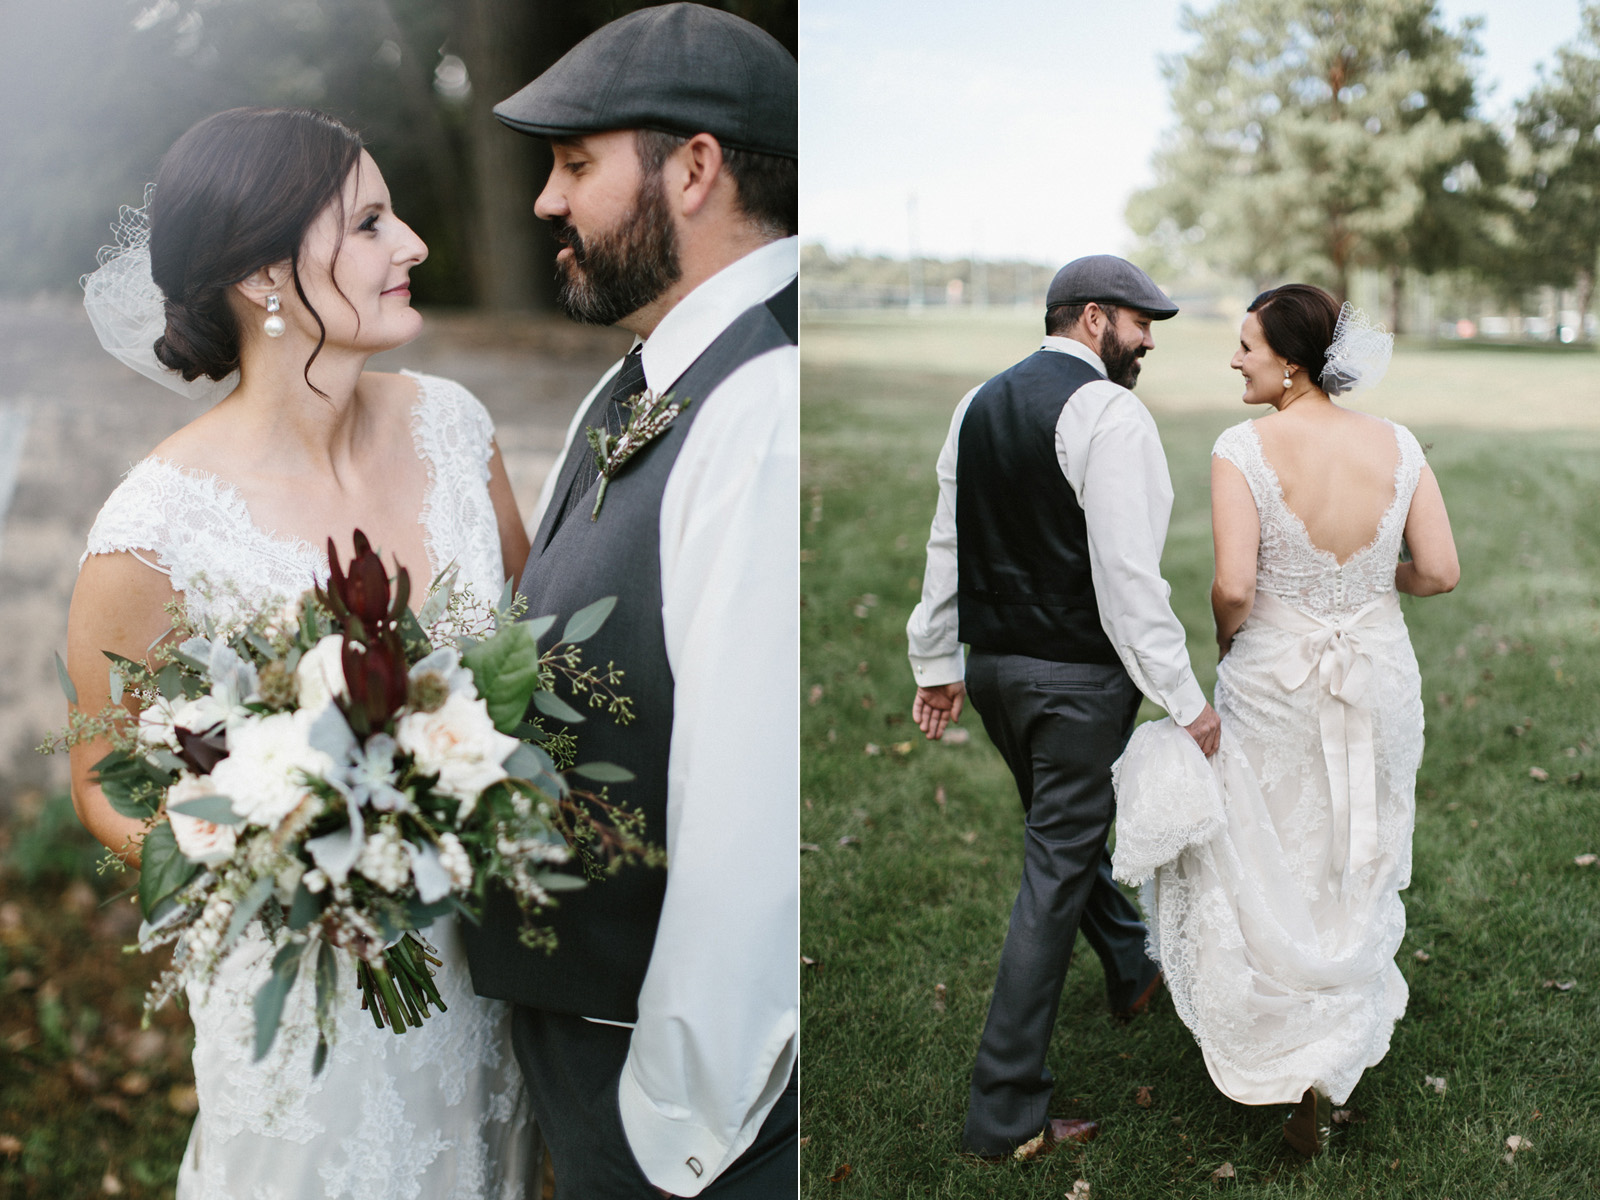 sioux_falls_desmoines_wedding_photographer_24.jpg